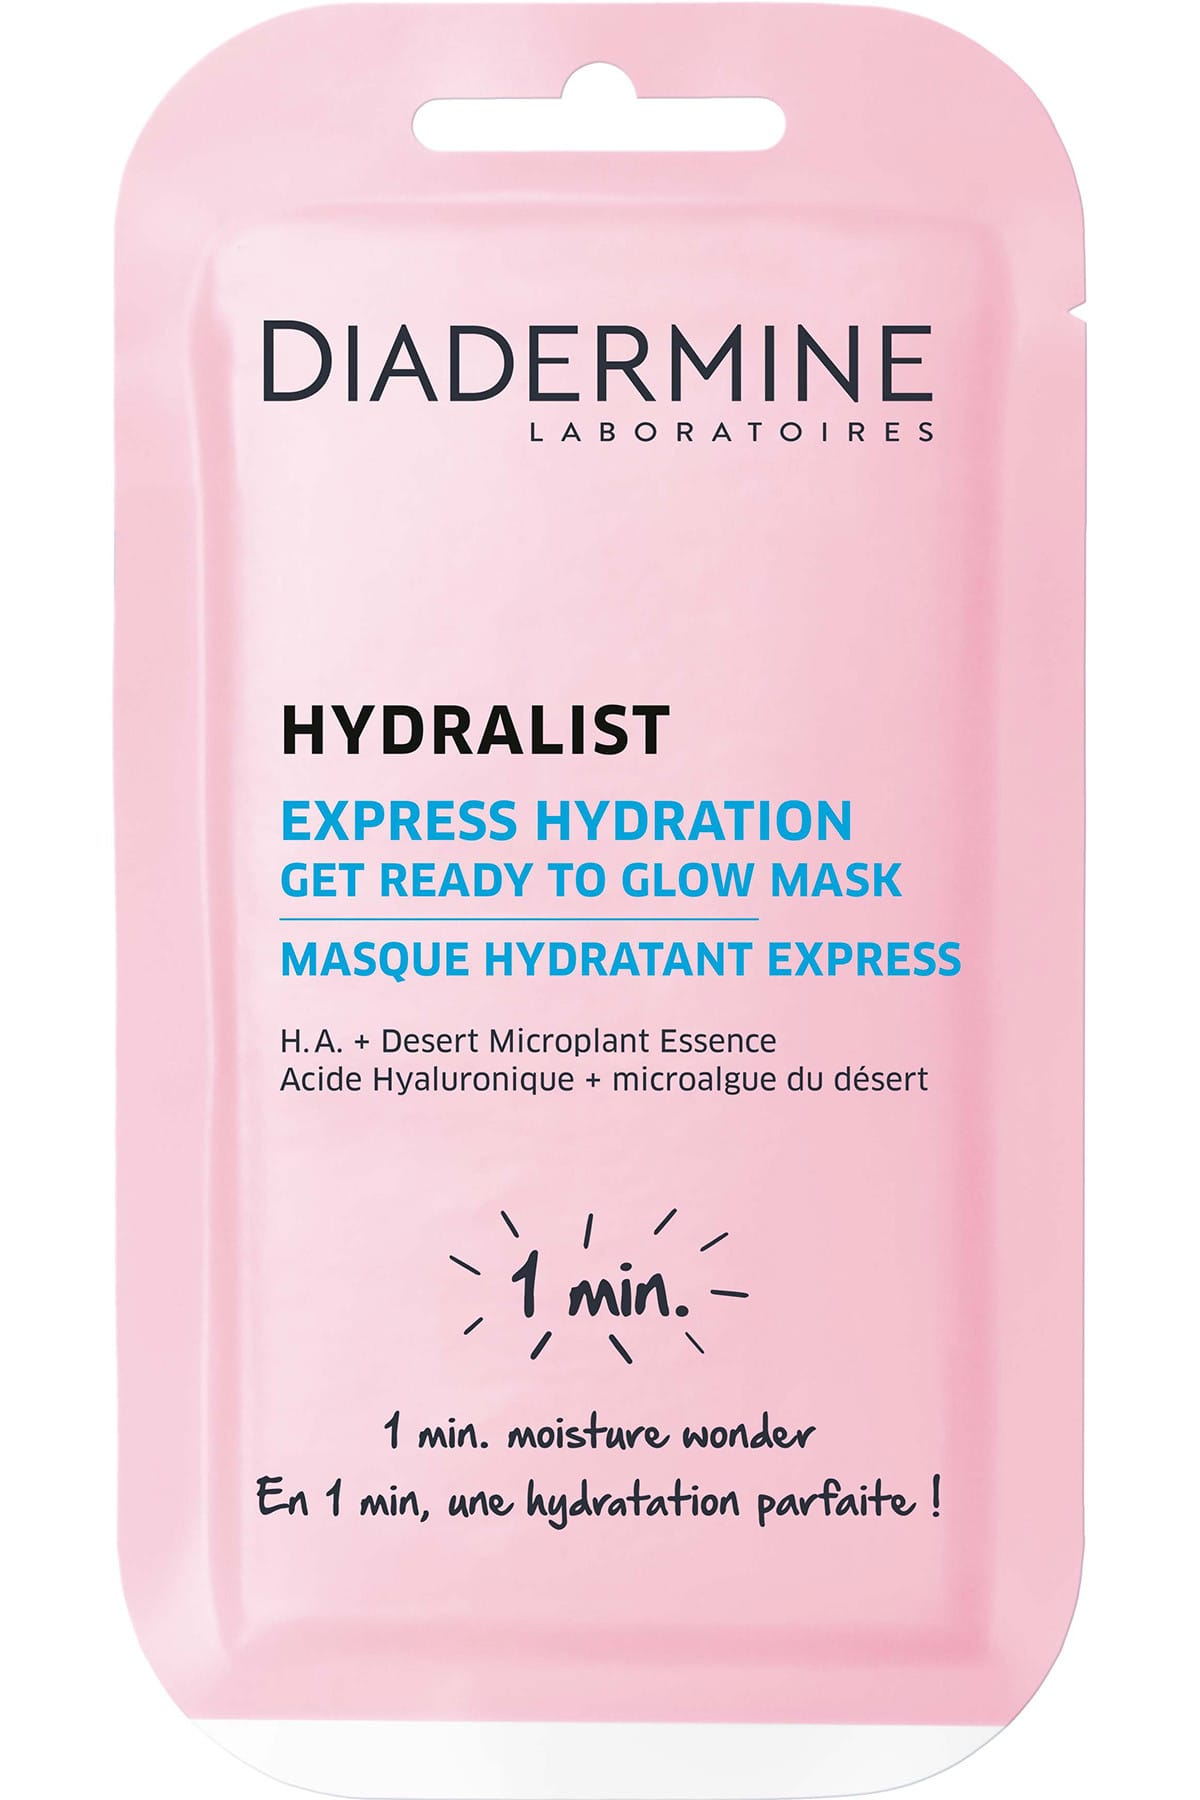 Diadermine Hydralıst Express Hydratıon Nem Maskesi 8 ml 1